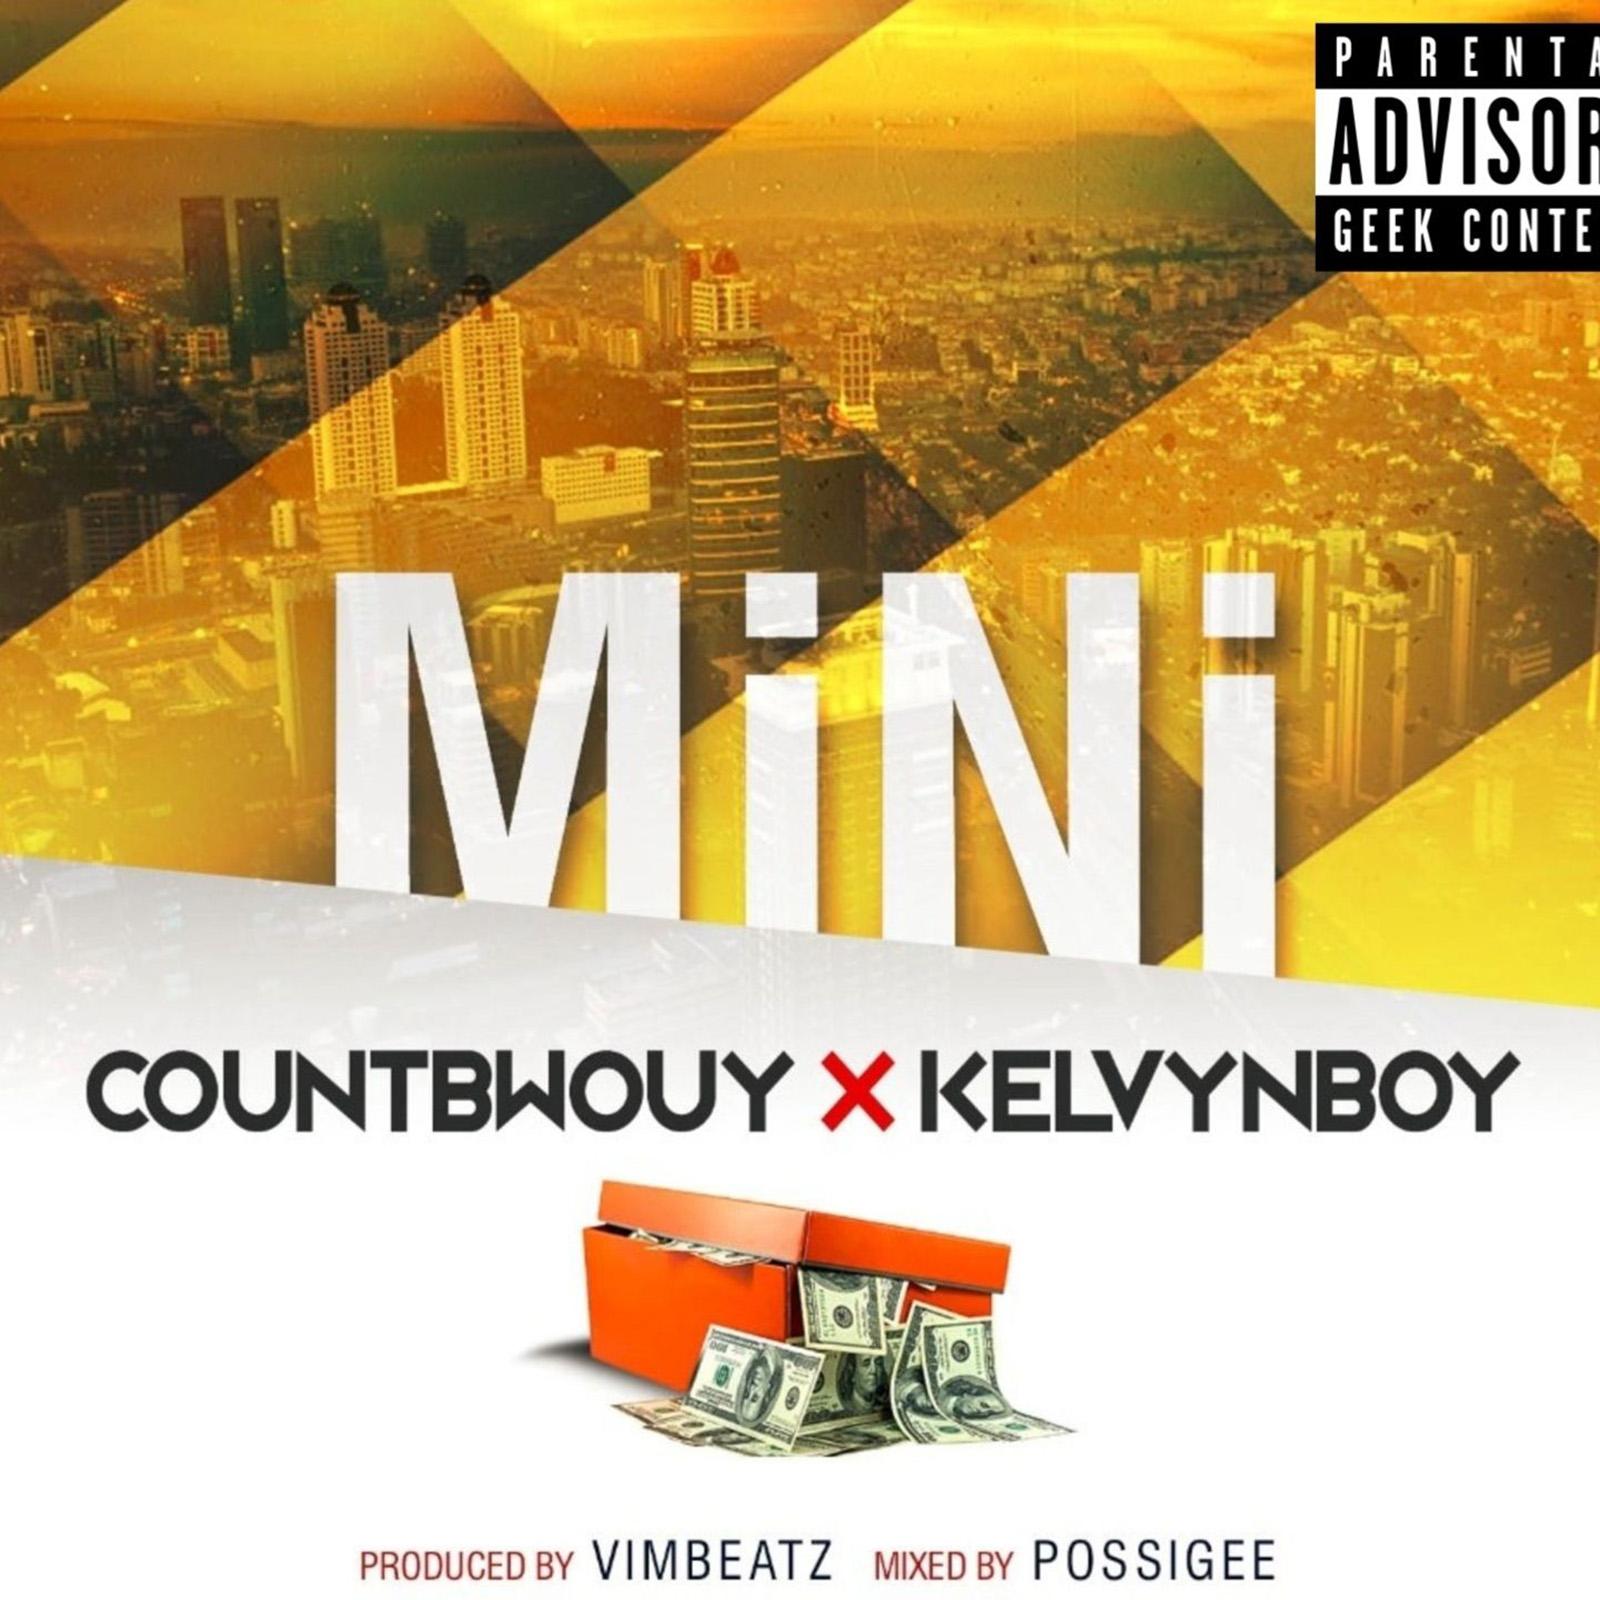 Mini by Countbwouy feat. Kelvynboy